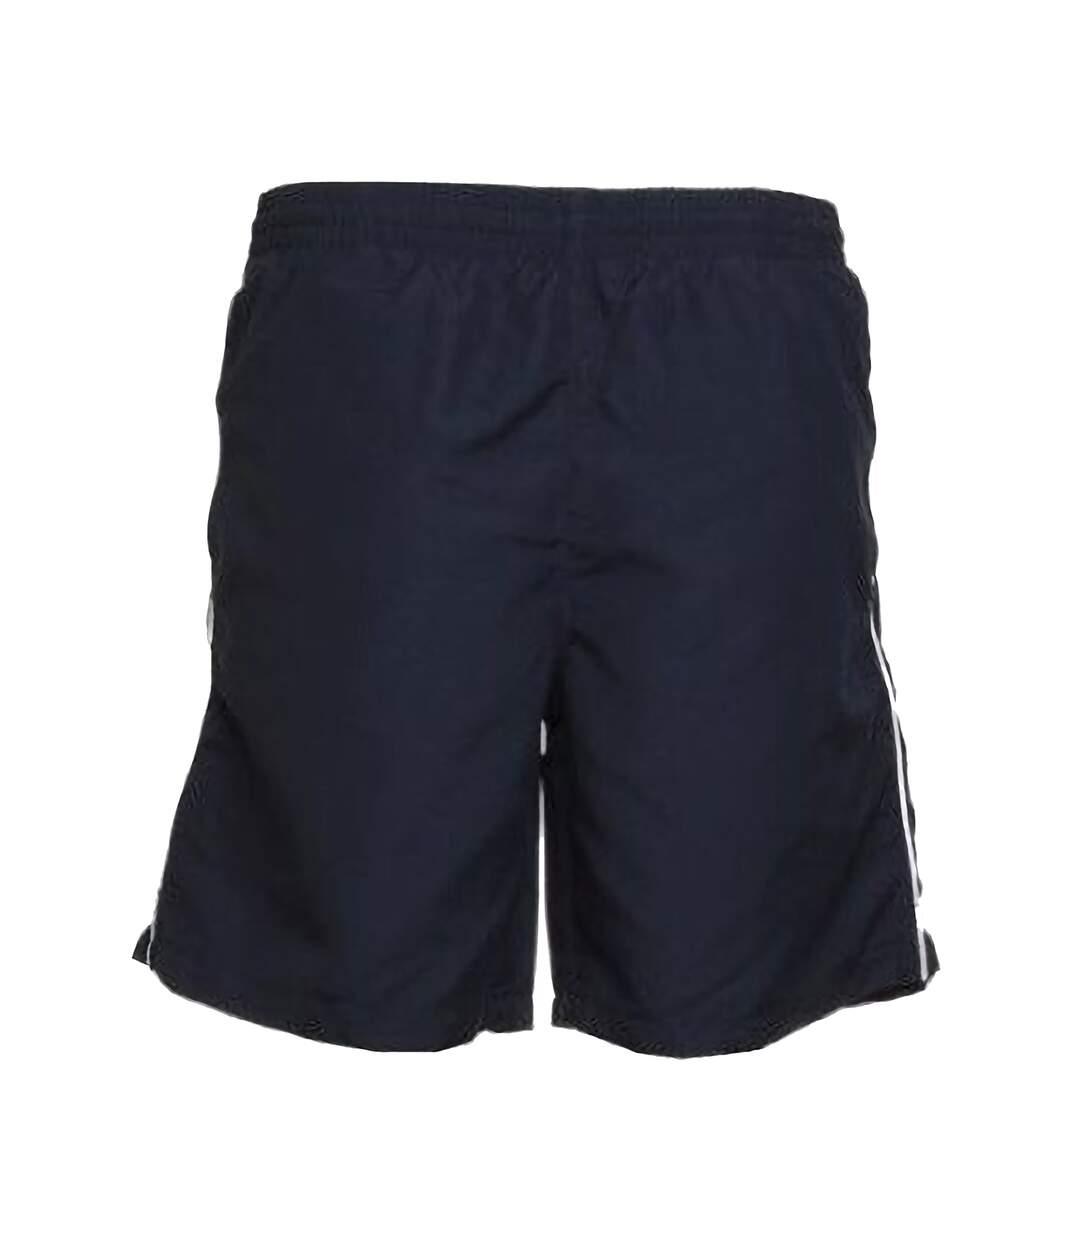 Gamegear® Track Sports Shorts / Mens Sportswear (Navy/White) - UTBC439